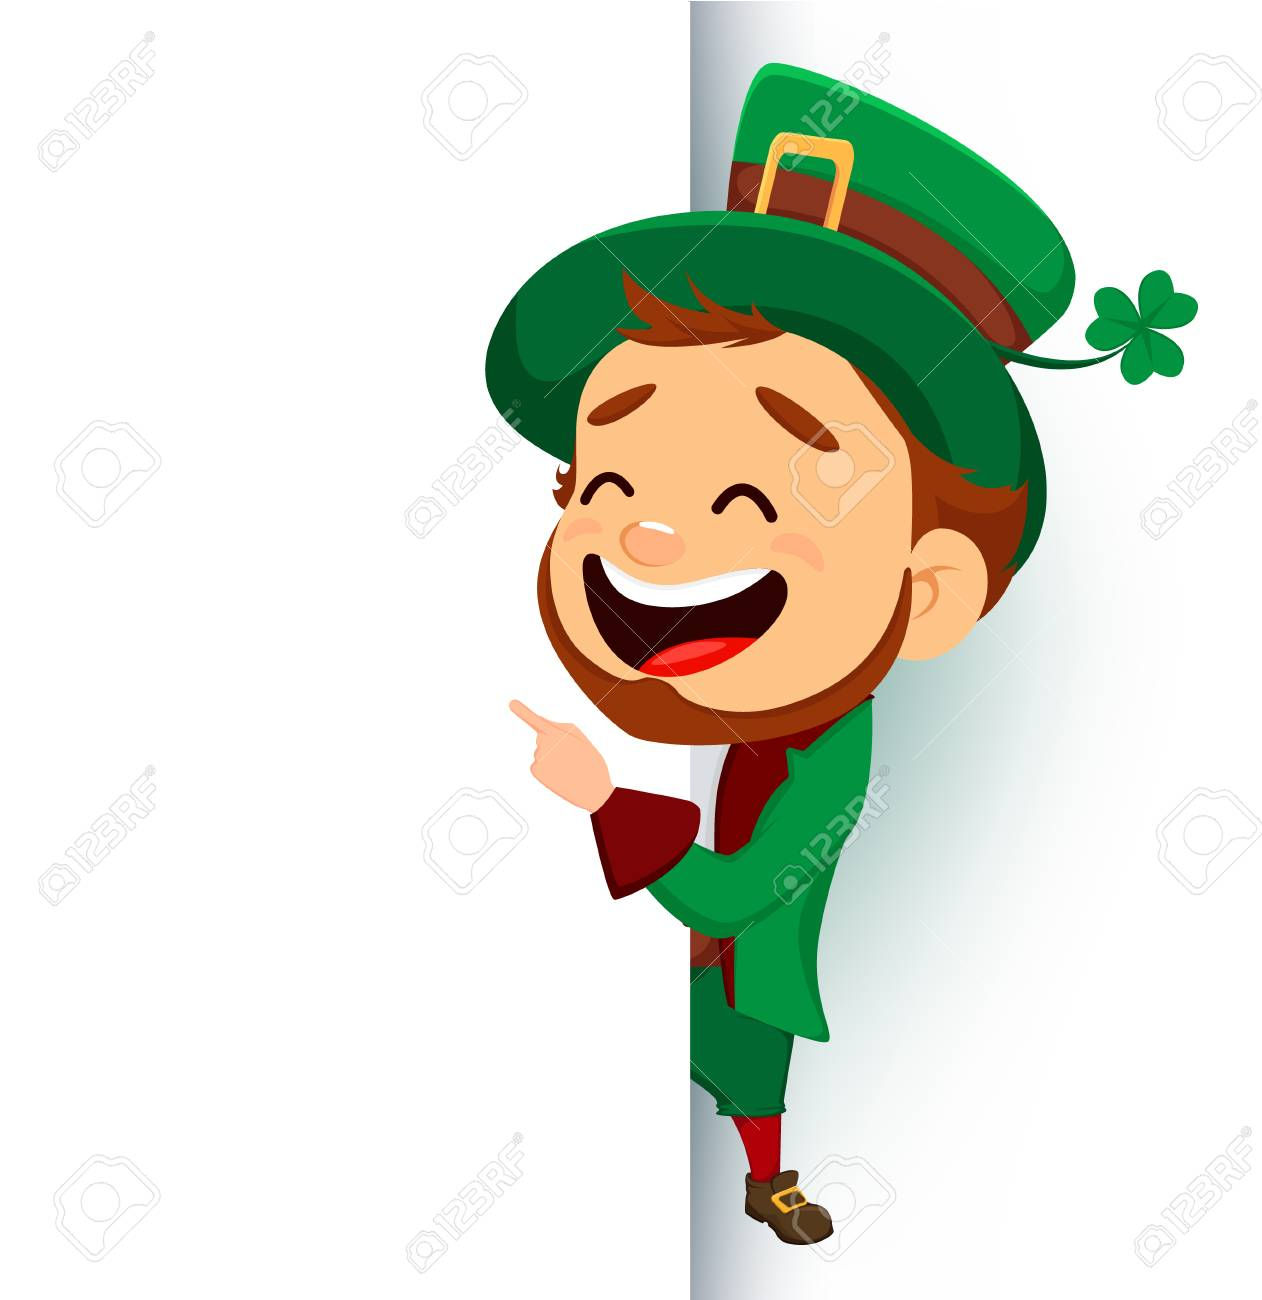 saint patrick s day design with funny leprechaun vector illustration rh 123rf com leprechaun vector logo leprechaun vector png